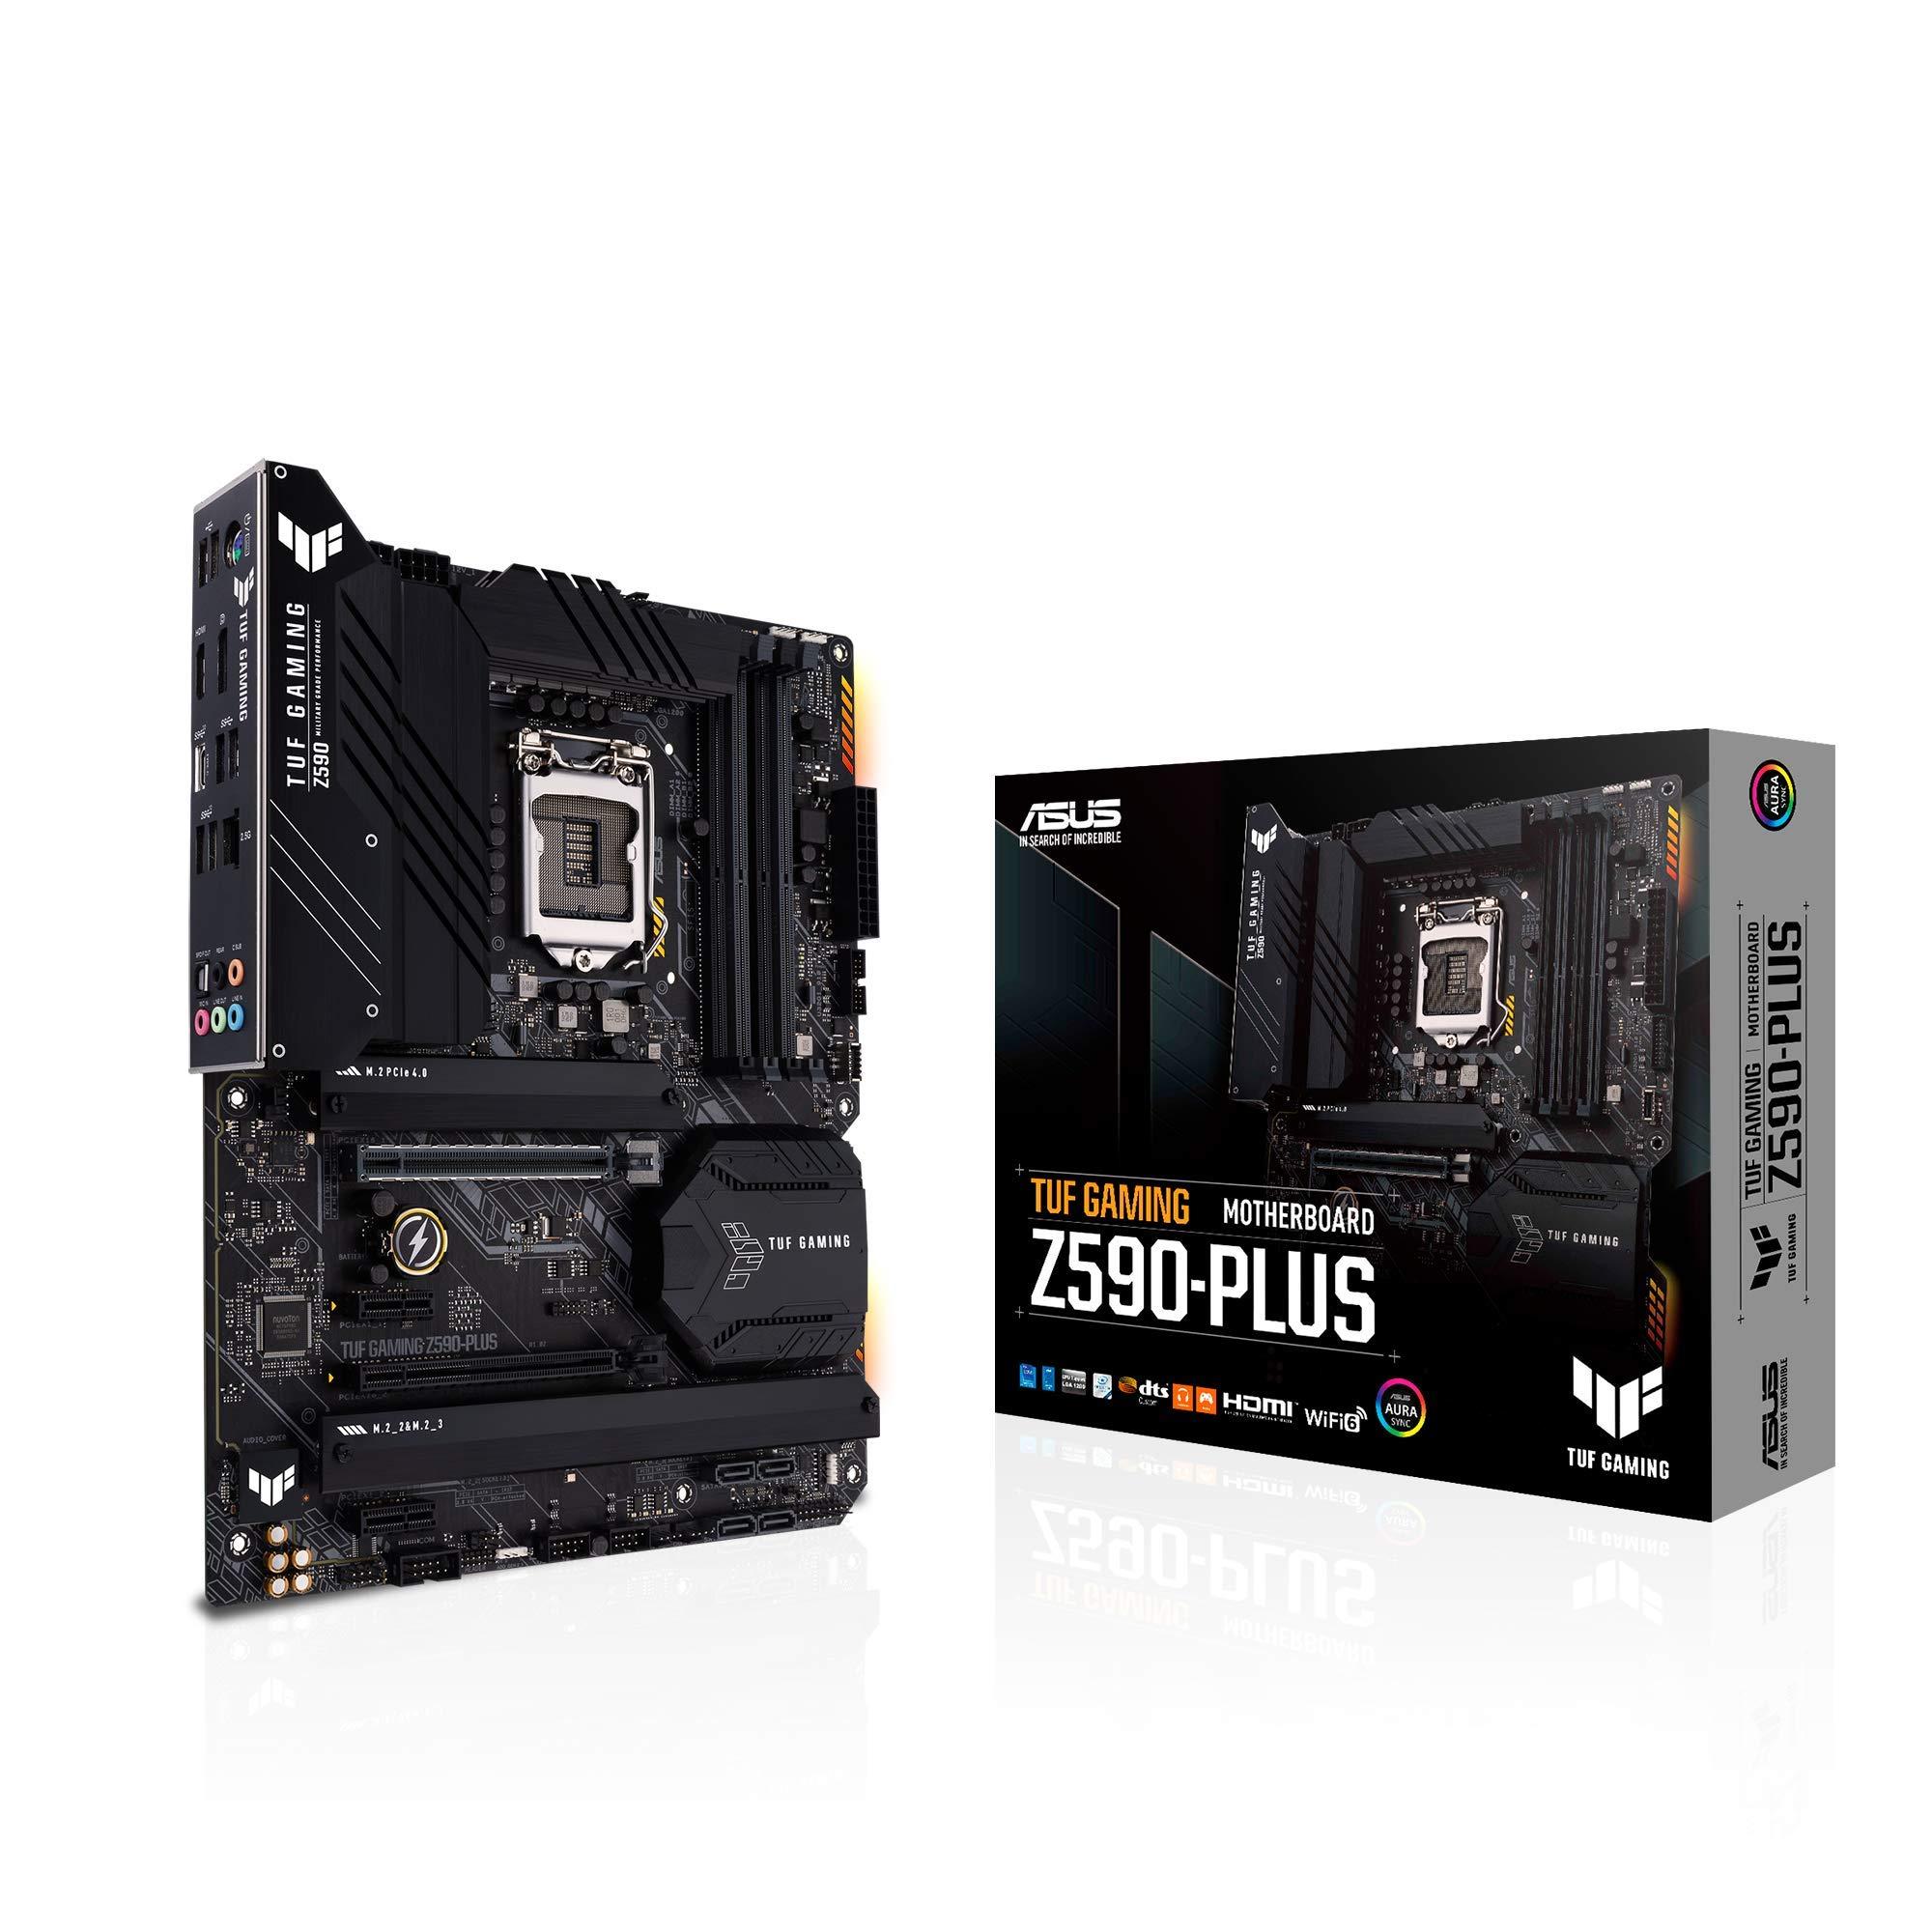 ASUS TUF Gaming Z590-Plus, LGA 1200 (Intel11th/10th Gen) ATX